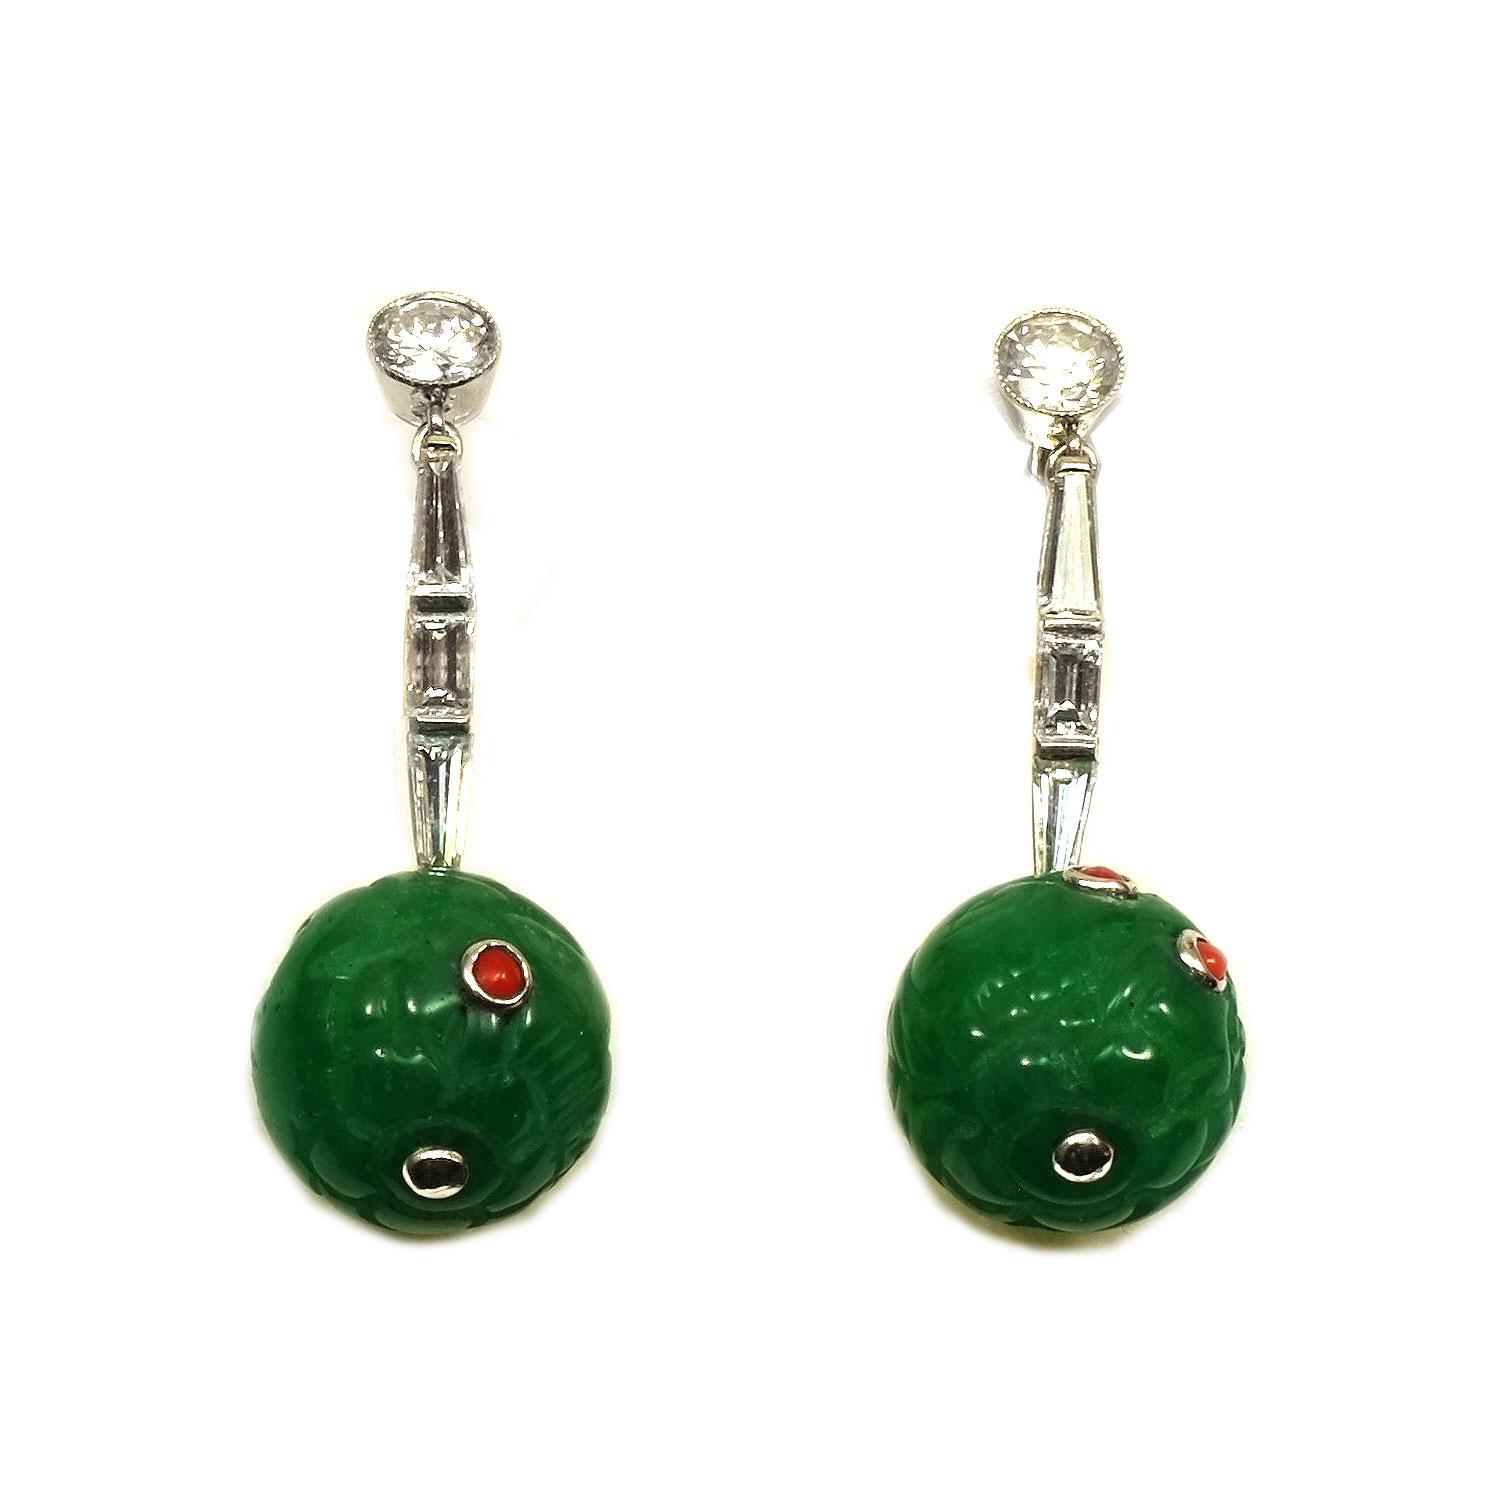 Details zu Art Deco Ohrringe mit Jade & 1.5 ct Diamanten Koralle Platin Jadeit 玉 Earrings